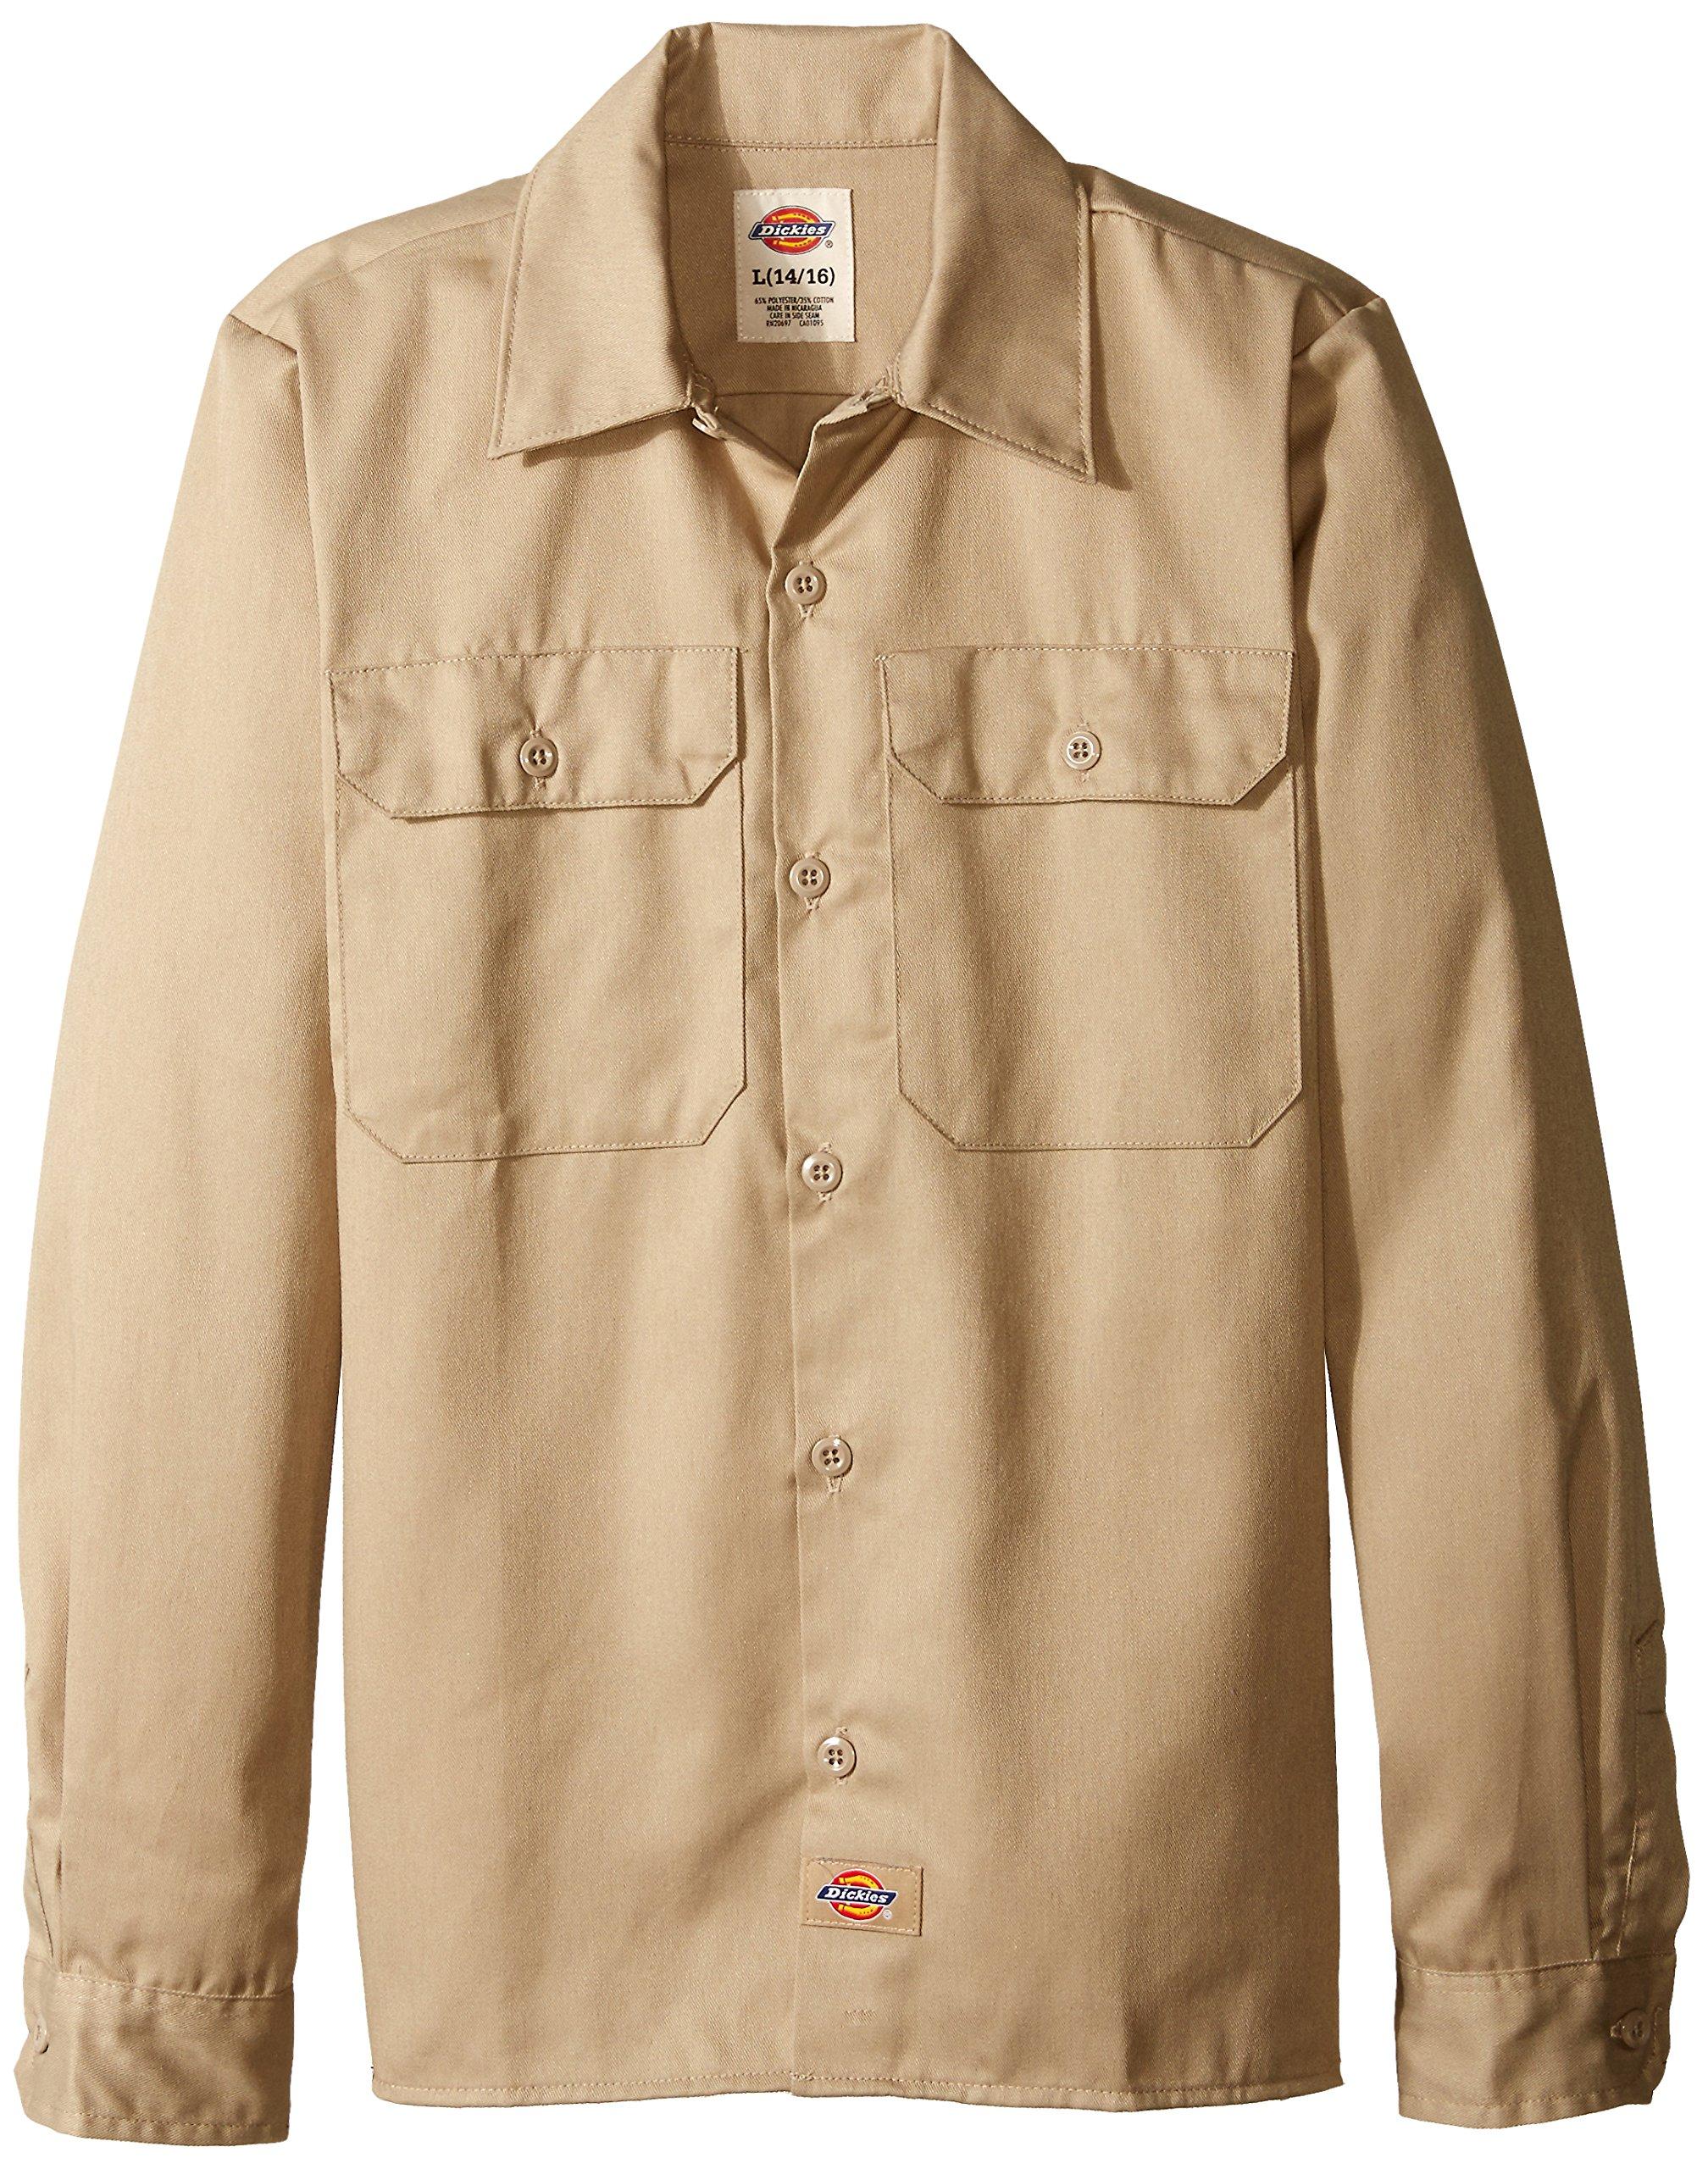 Dickies Big Boys' Twill Long Sleeve Shirt, Khaki, Large (14/16)